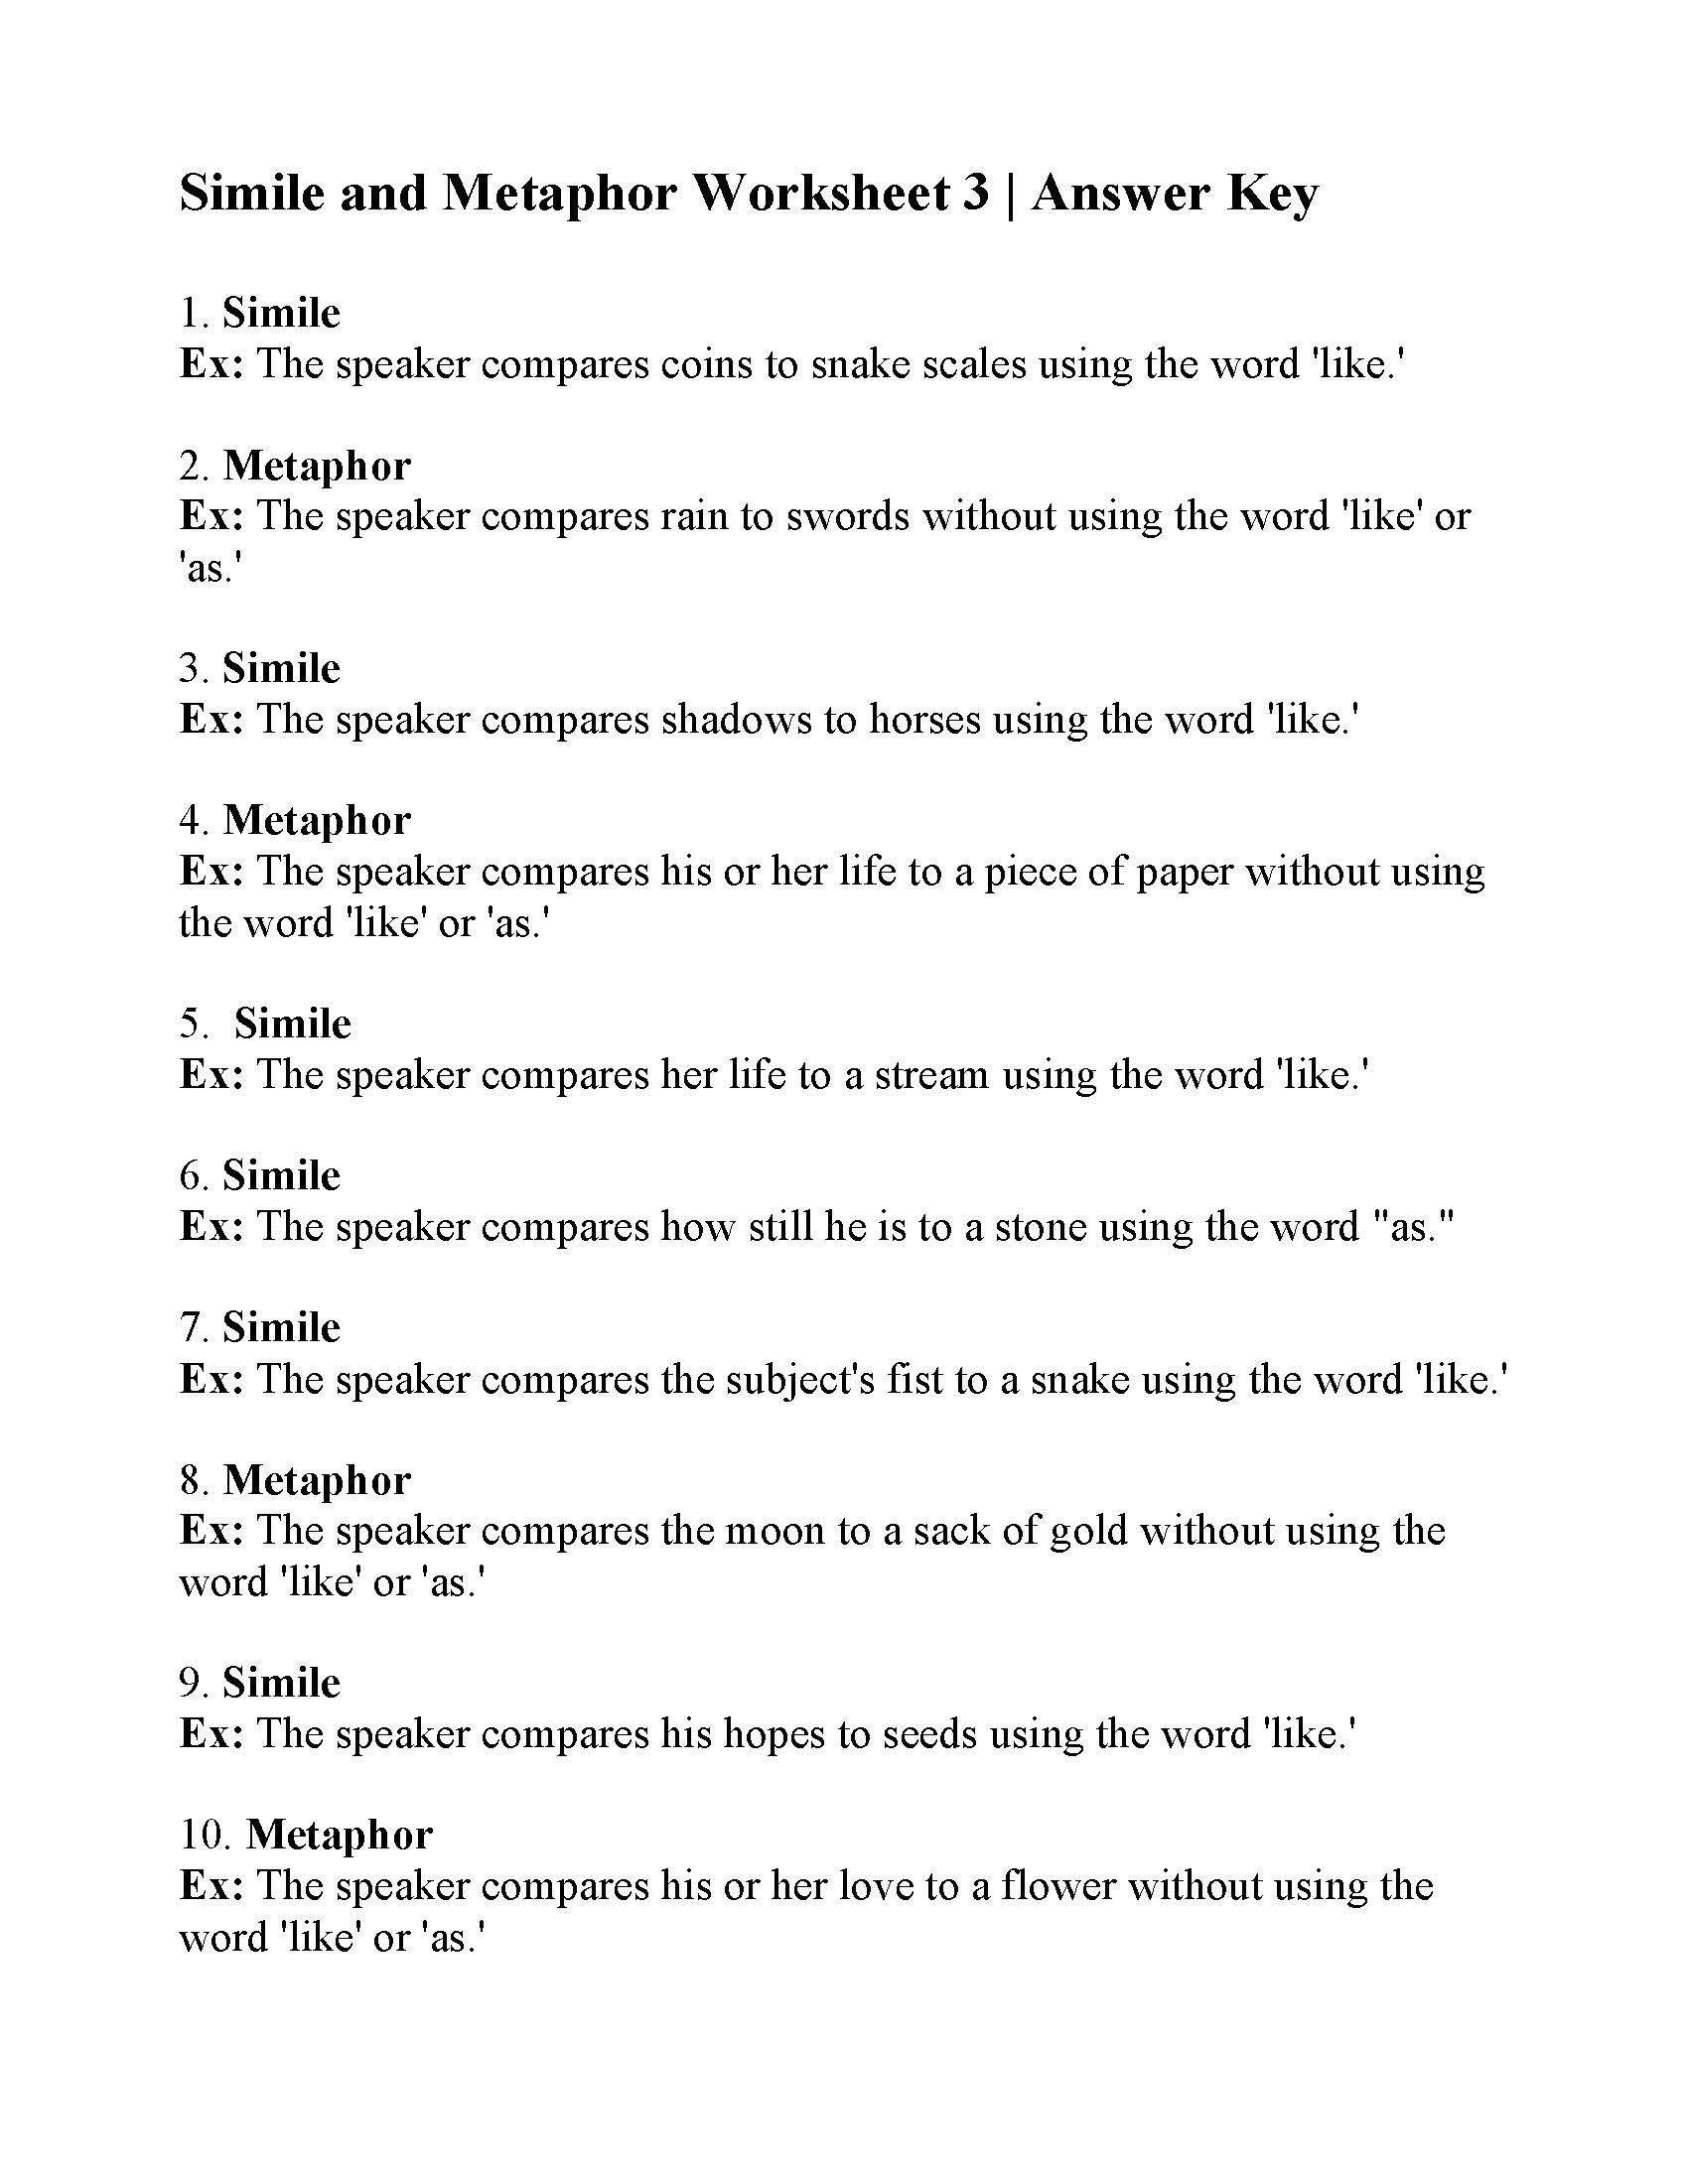 Figurative Language Worksheet Graphic Organizer Teaching Figurative Language Figurative Language Figurative Language Worksheet